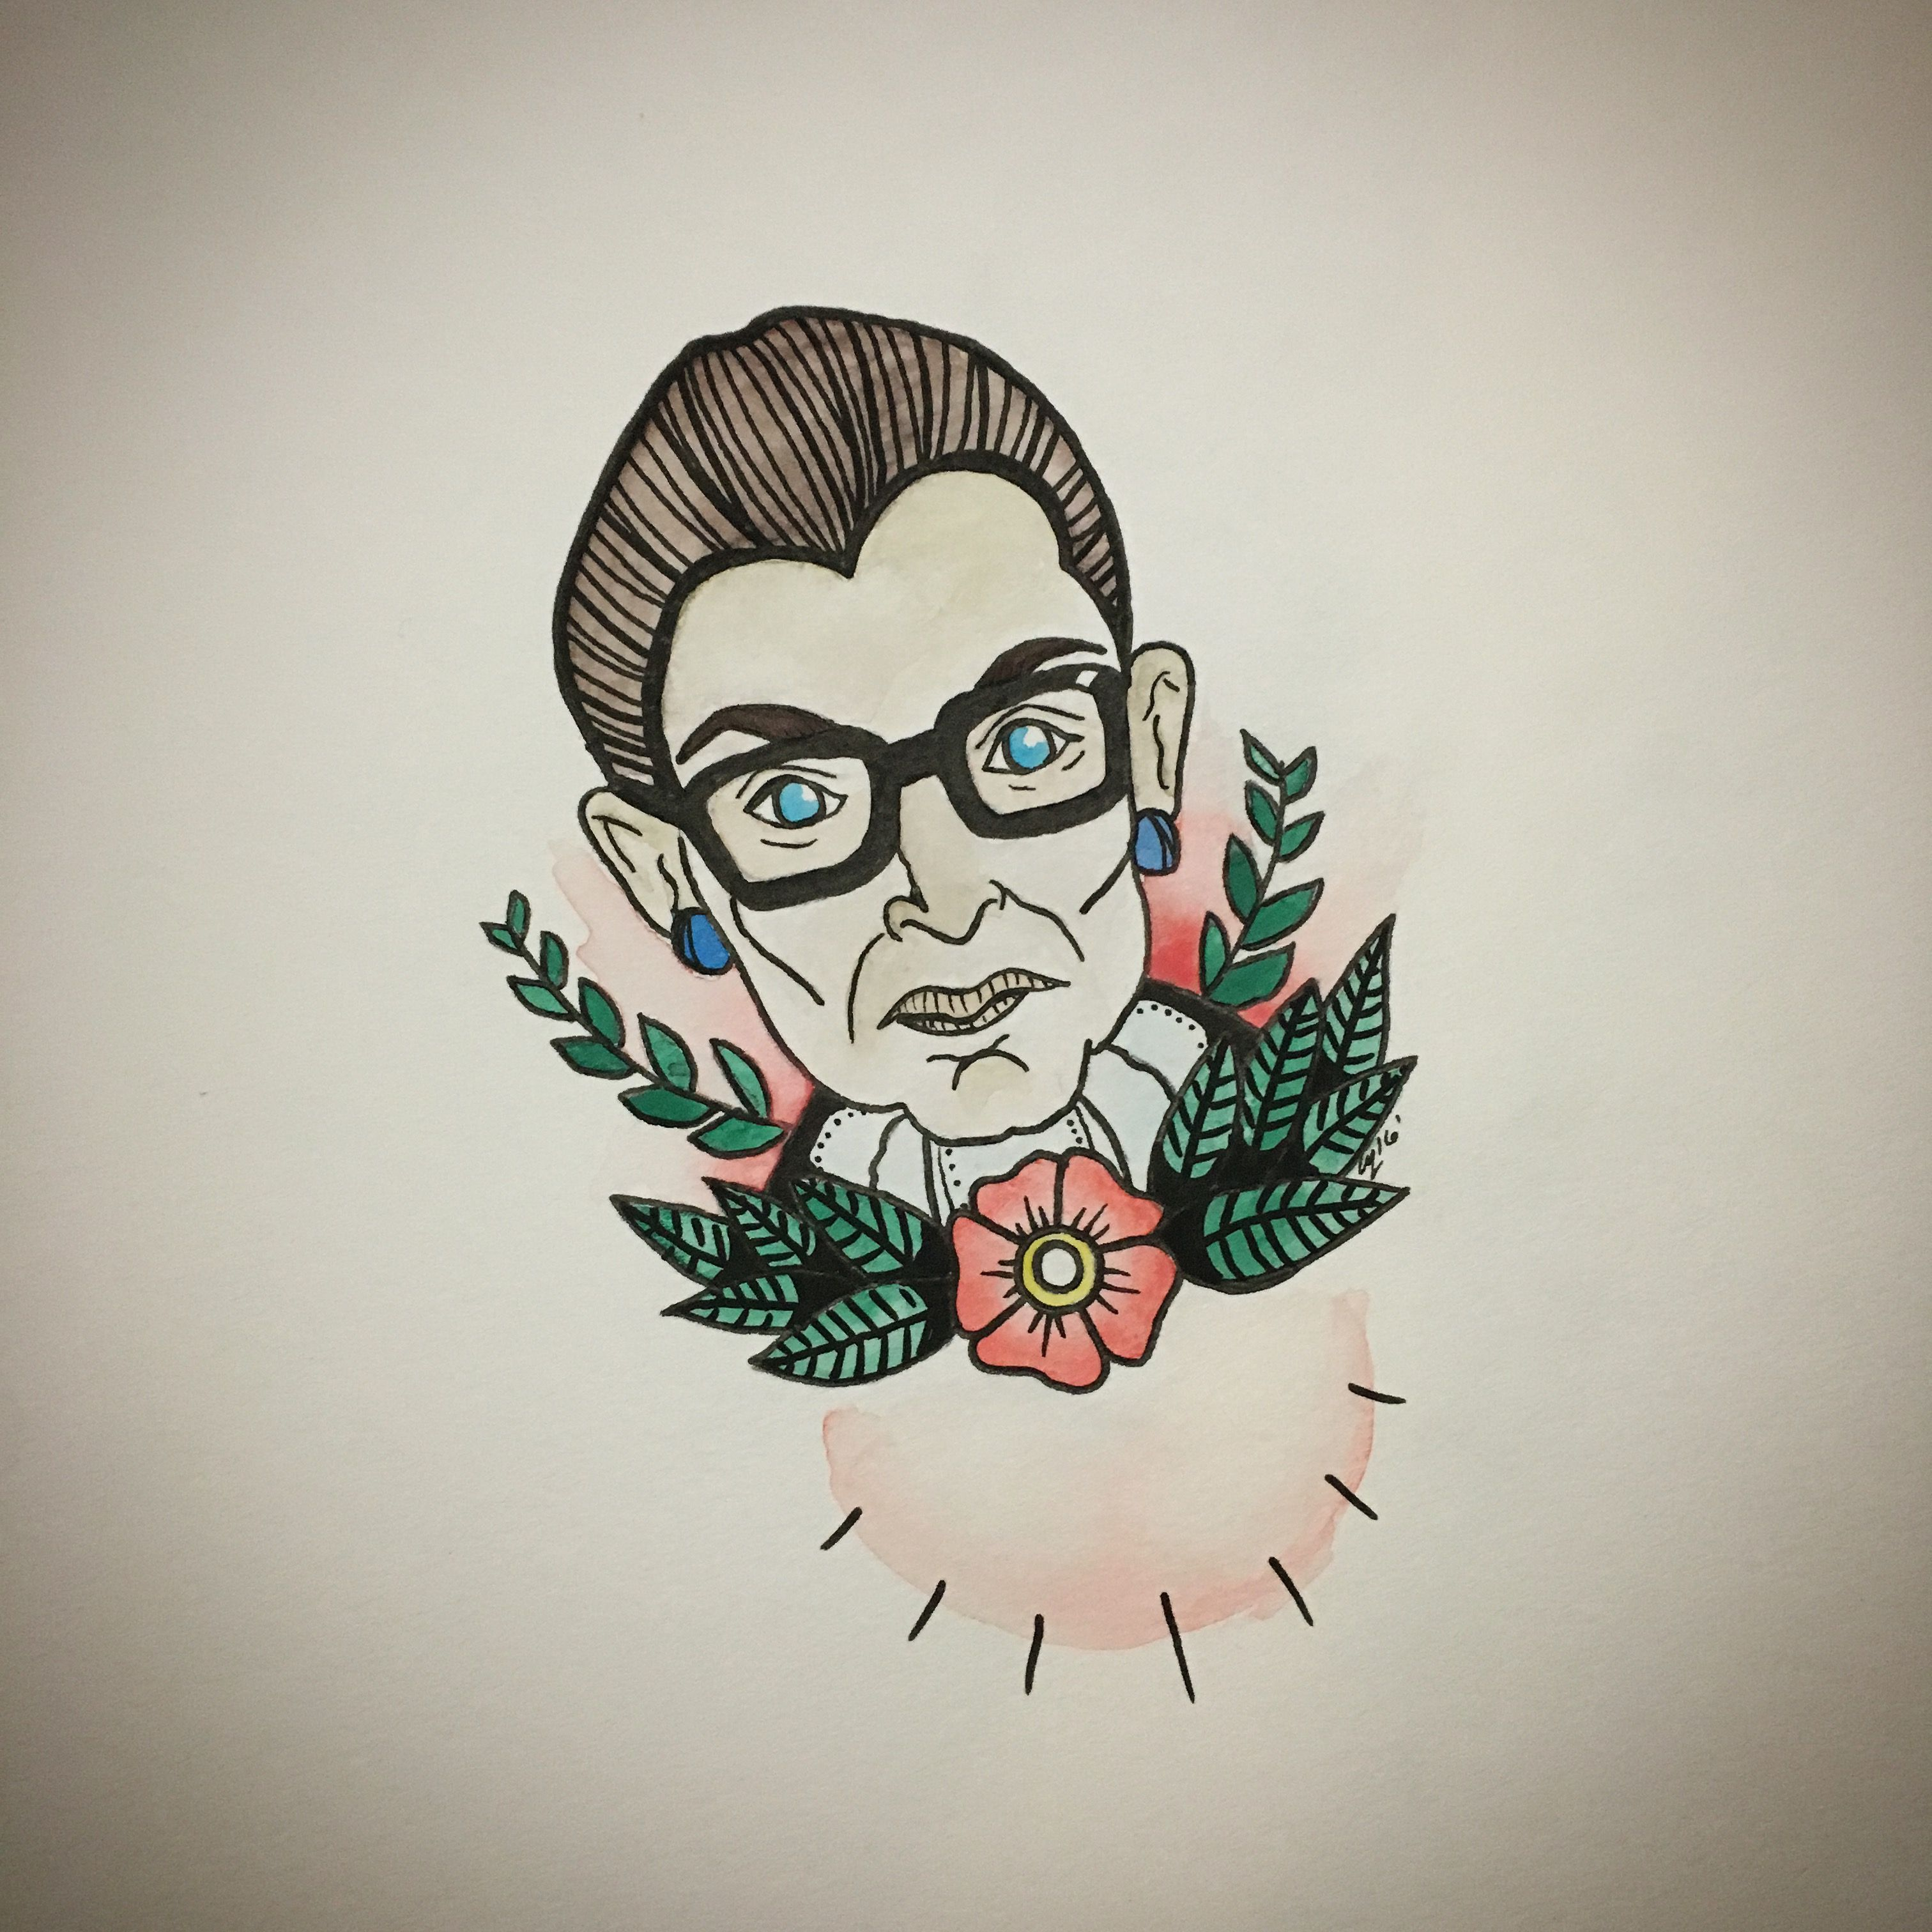 Ruth Bader Ginsburg feminist flash watercolor tattoo art